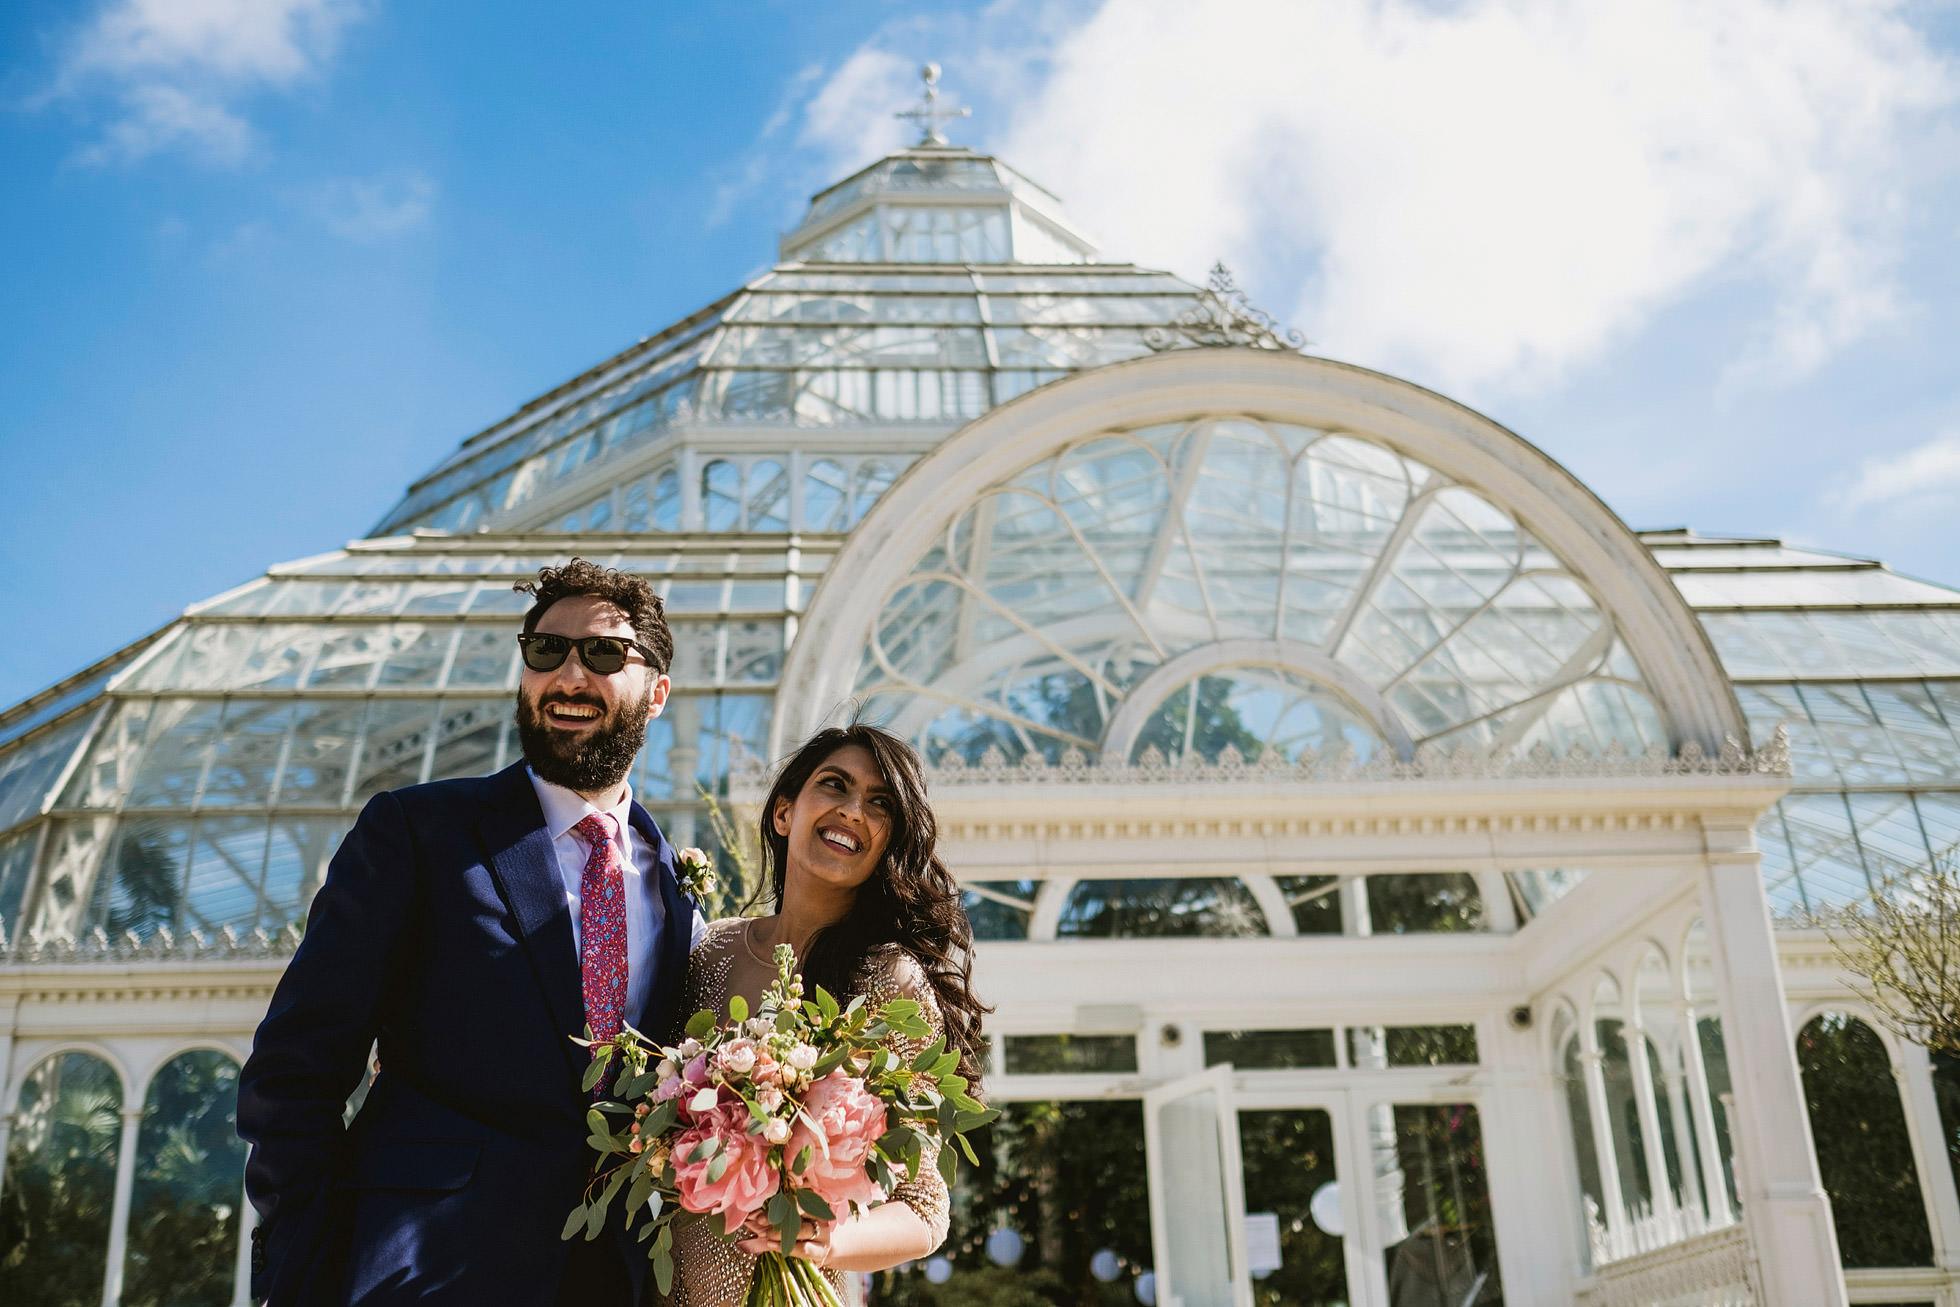 Sefton Park Palm House Weddings